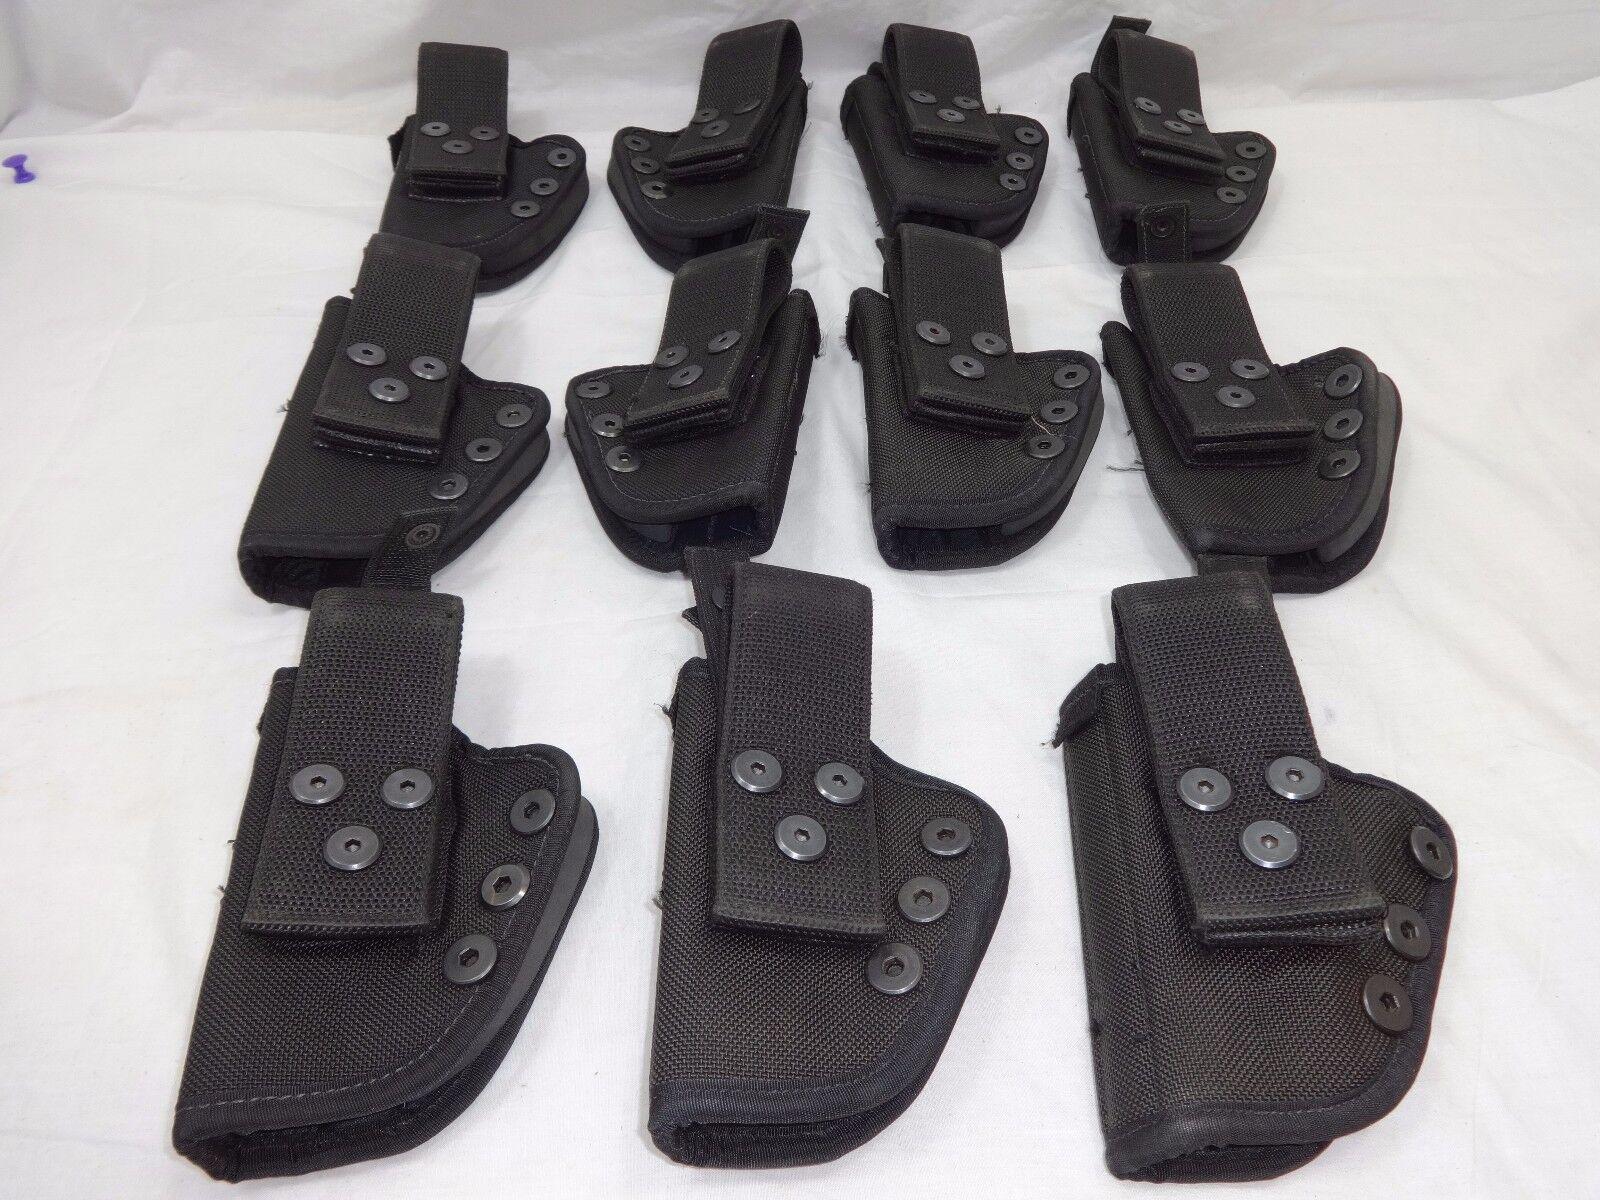 11 Negro Nylon Resistente Funda de pistola táctica militar pistola de mano